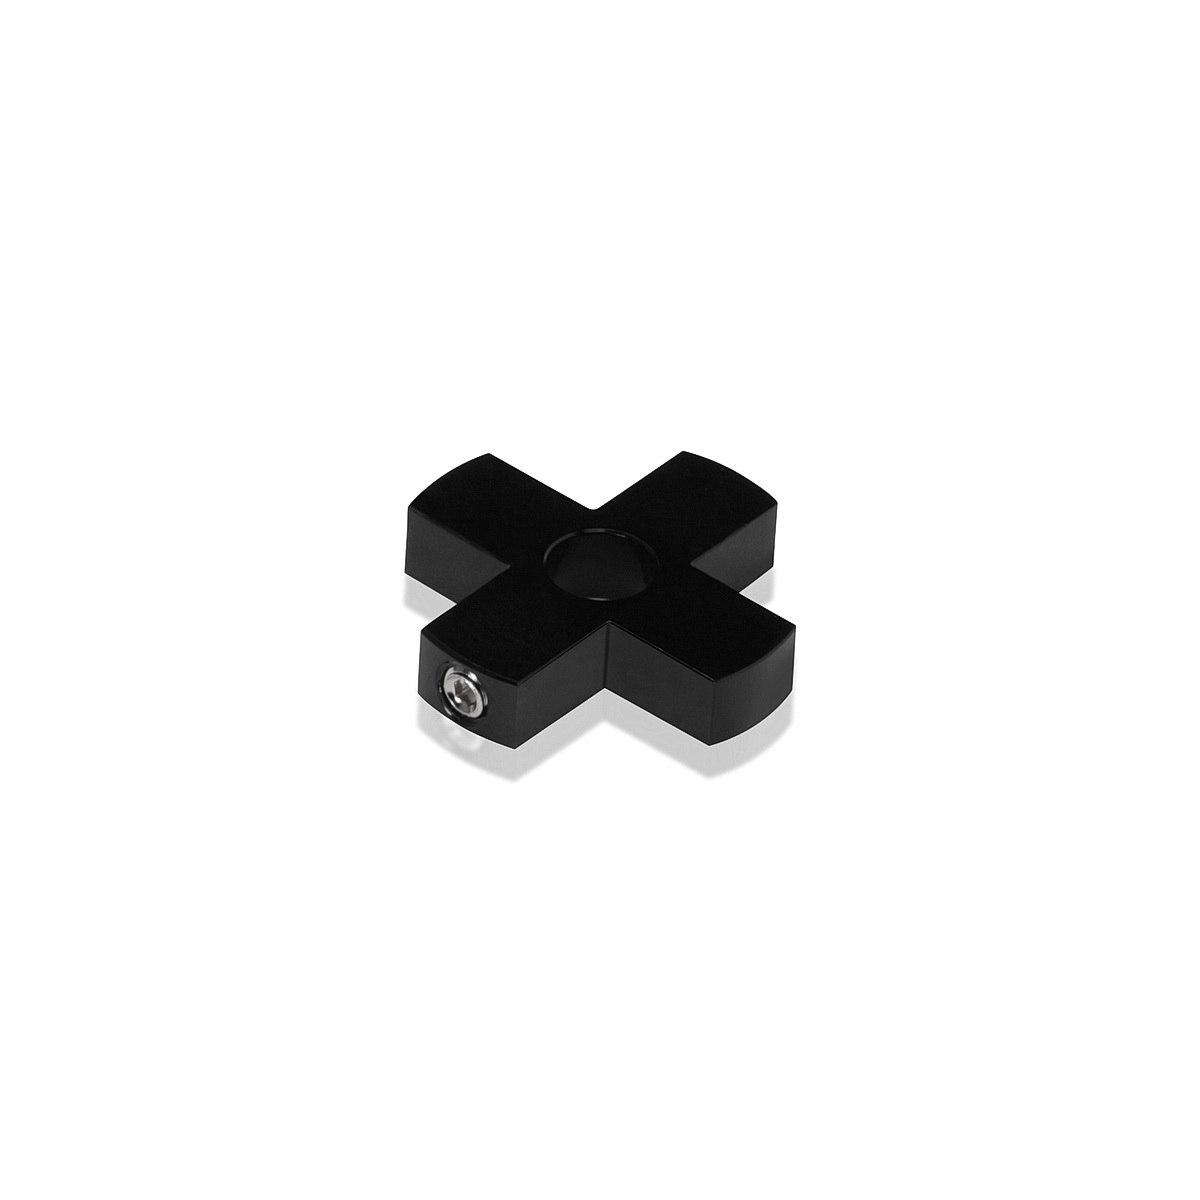 4-Way Standoffs Hub, Diameter: 1 1/4'', Thickness: 1/4'', Black Anodized Aluminum